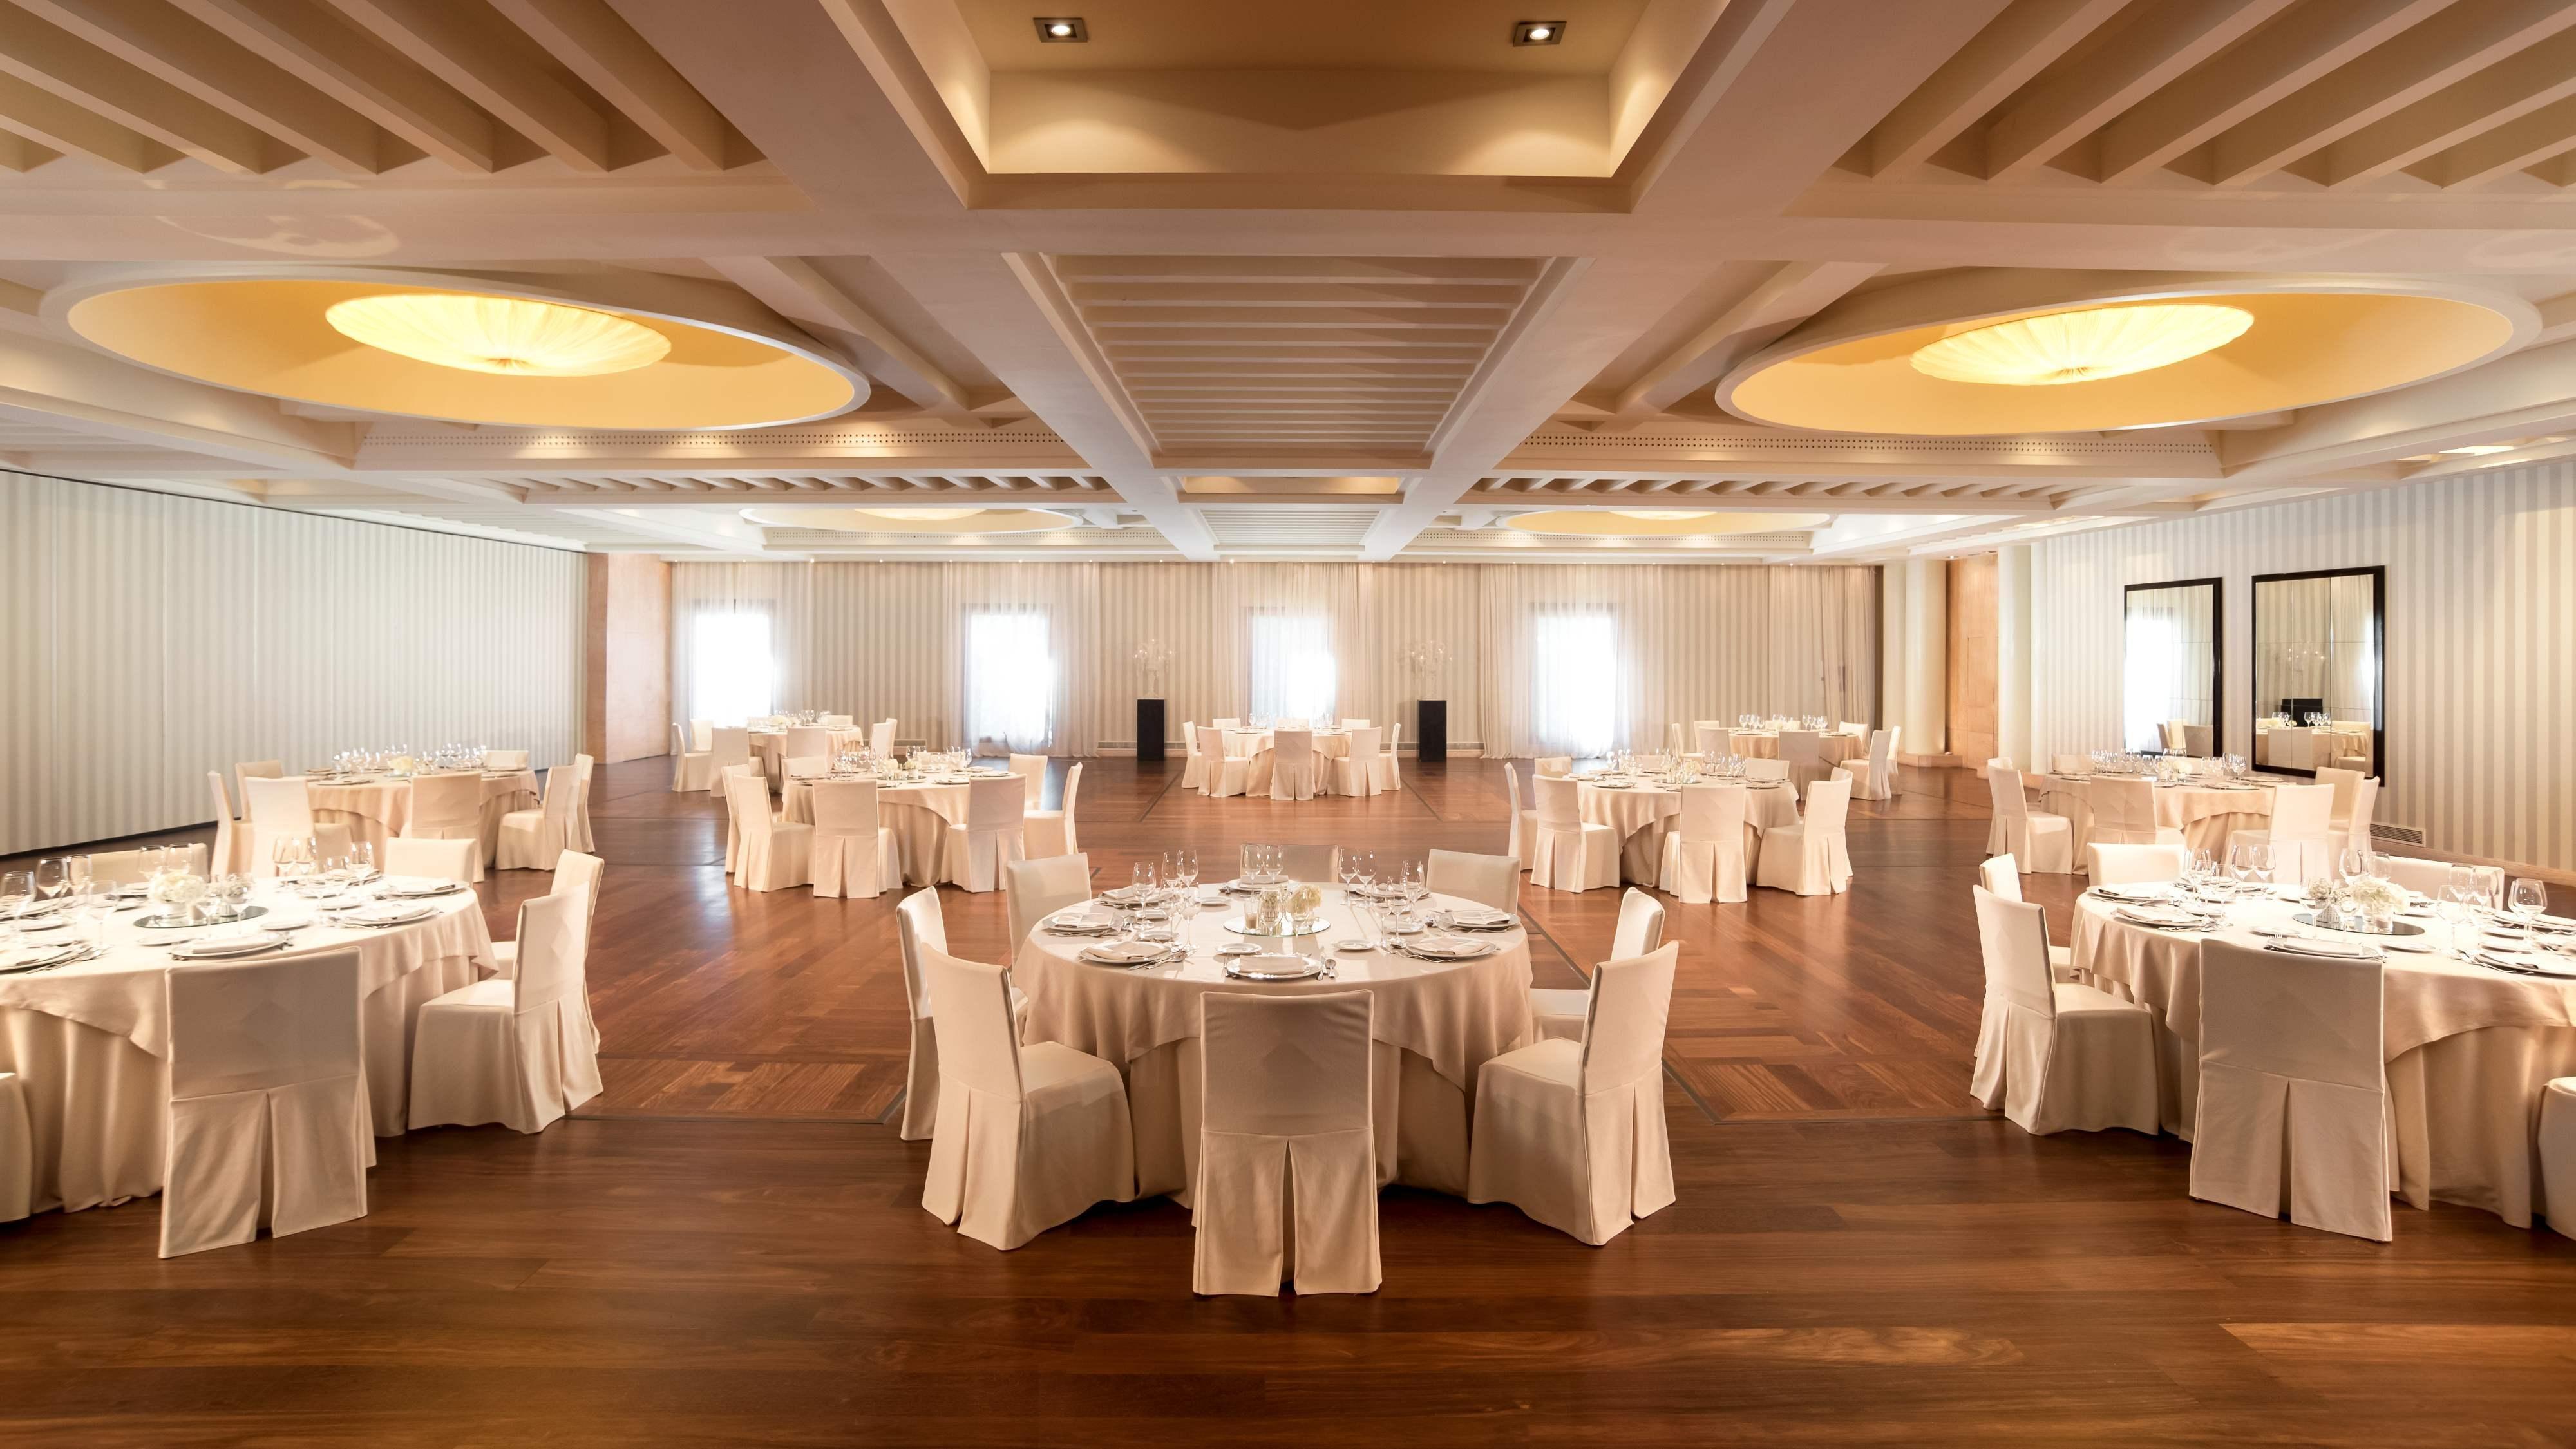 San Vicente Room - Banquet